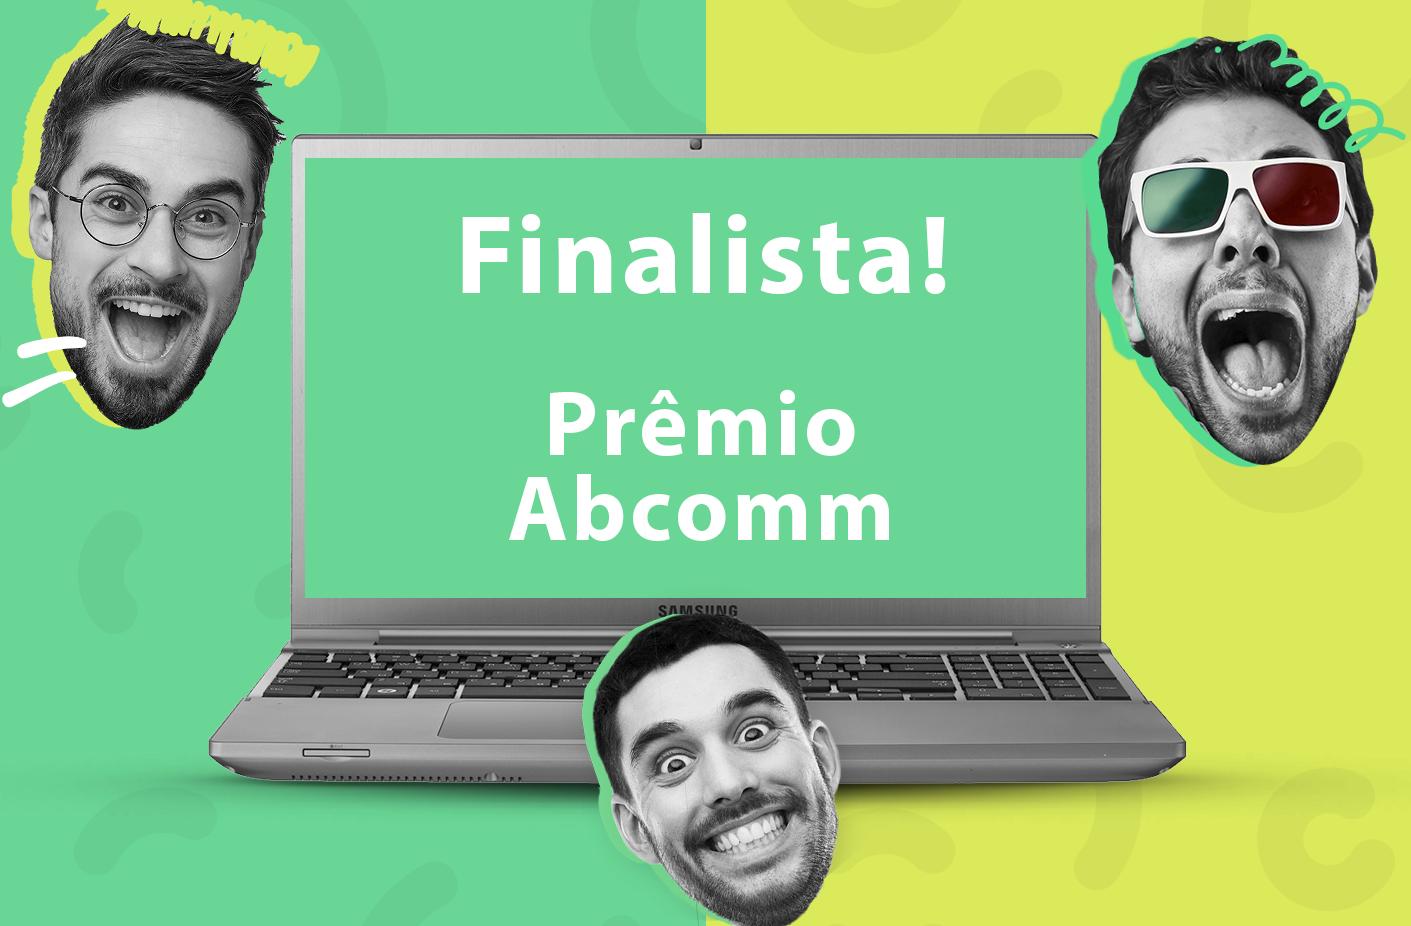 BLING É FINALISTA DO PRÊMIO ABCOMM. VOTE!